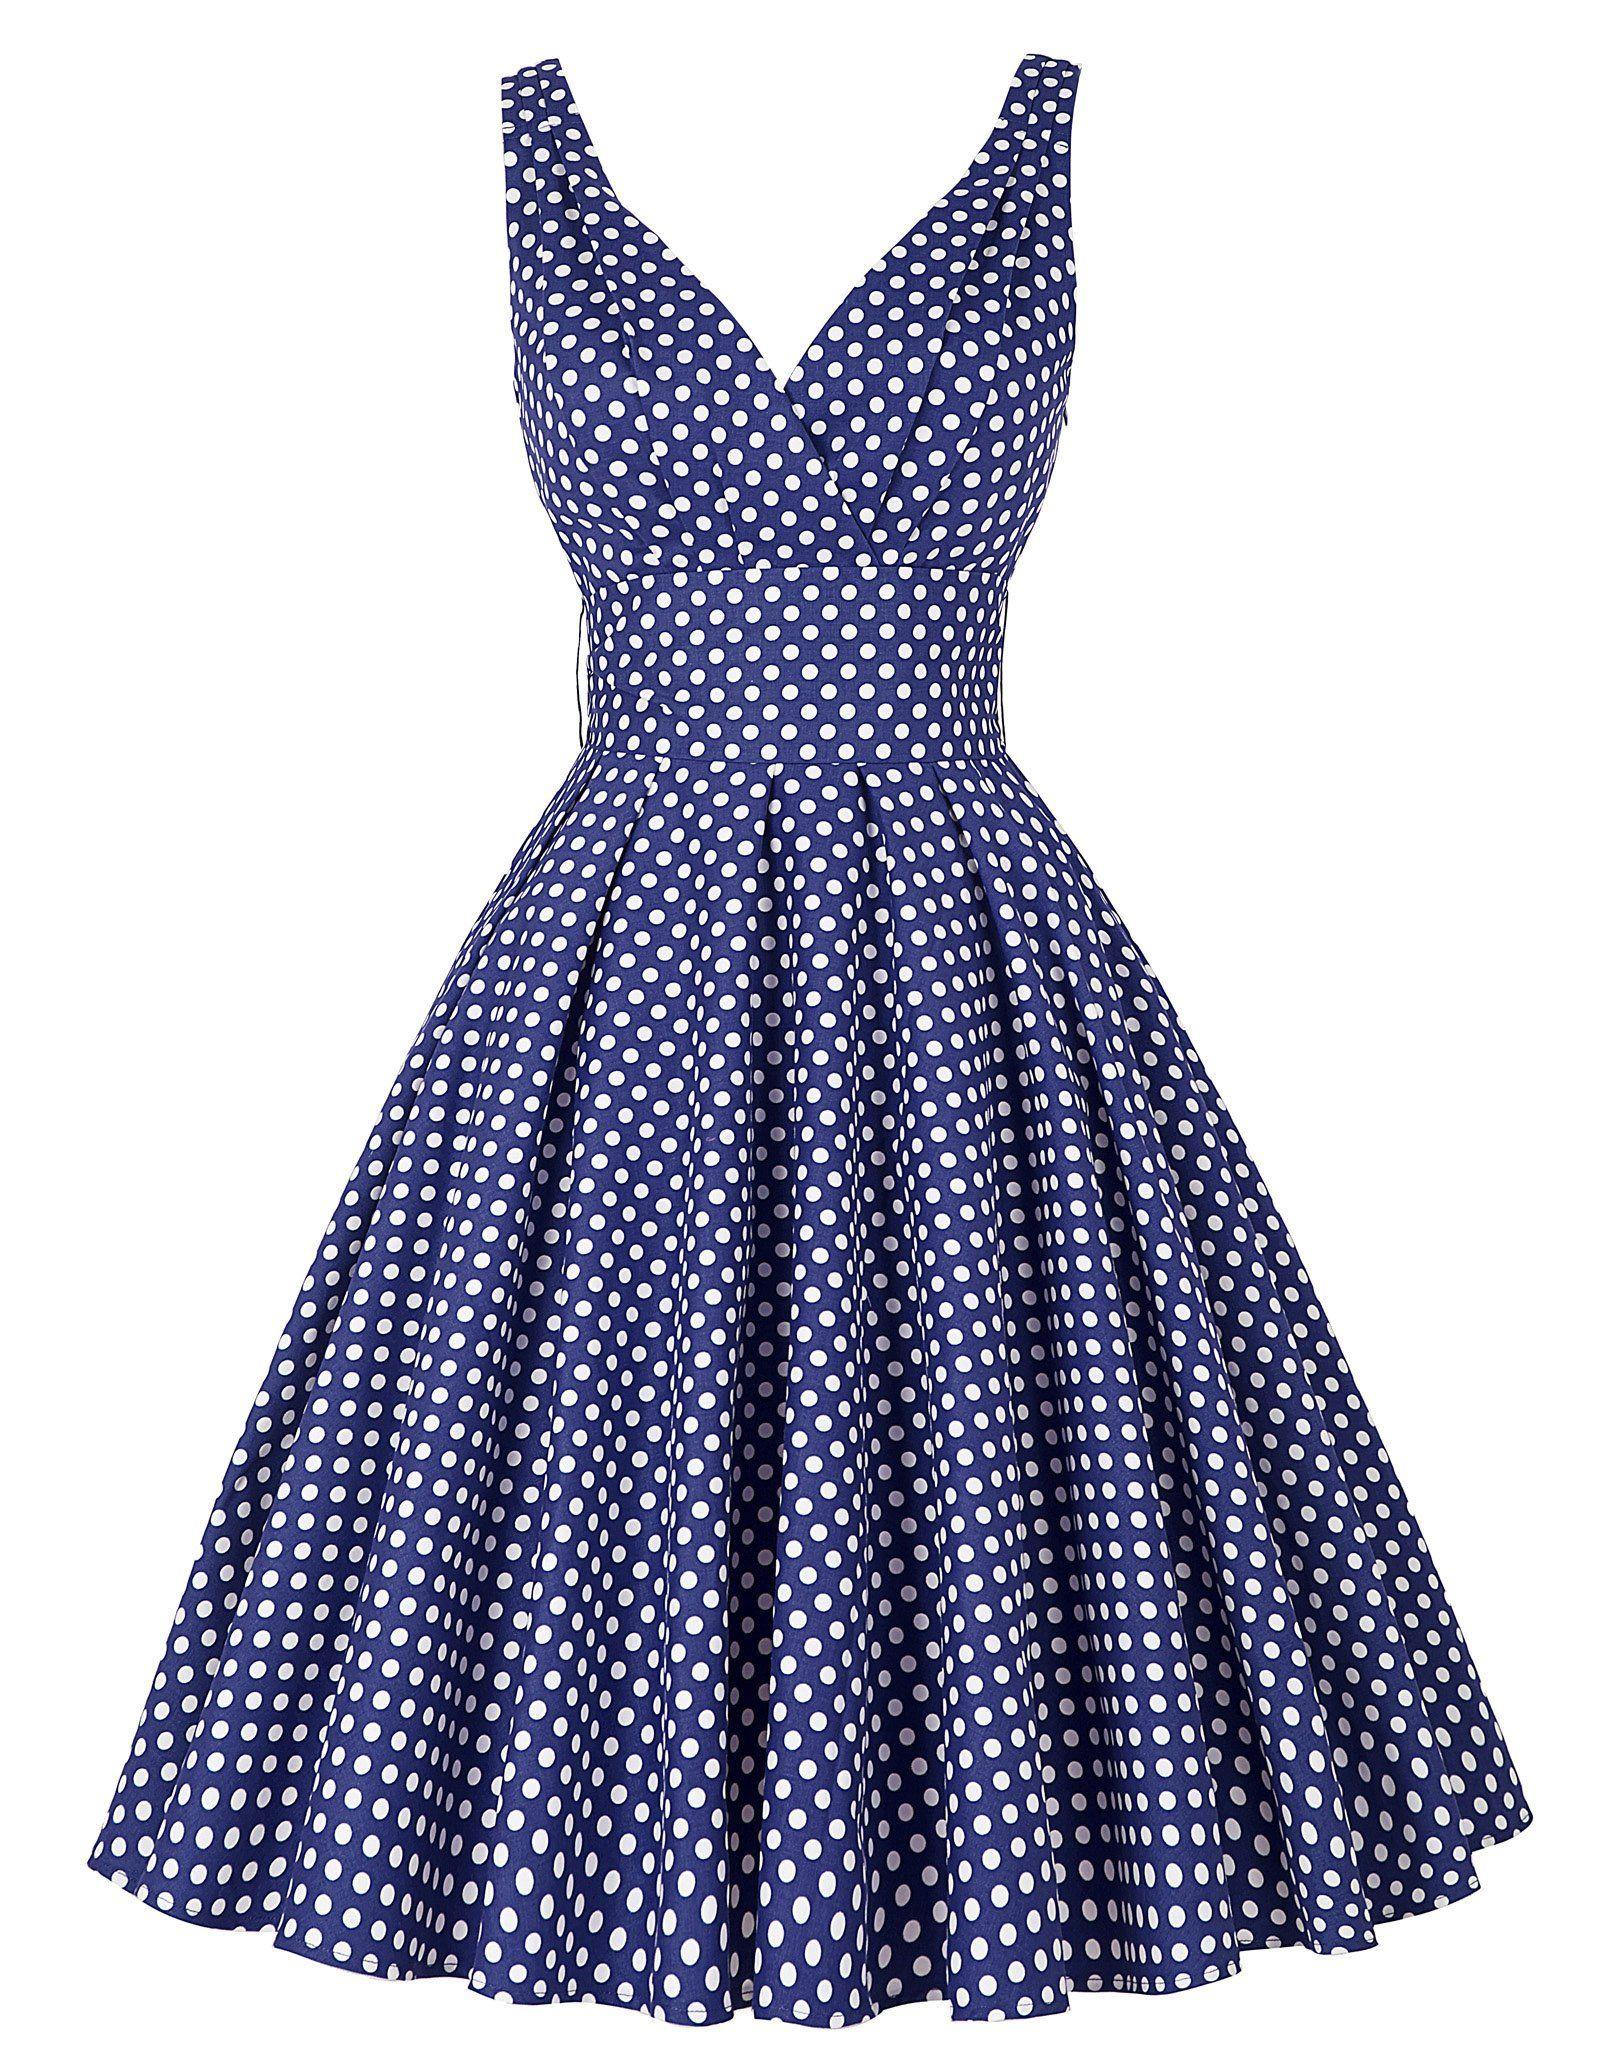 50s Vintage Hepburn Stil Polka Dots Swing-Party-Kleid Cocktailkleid ...